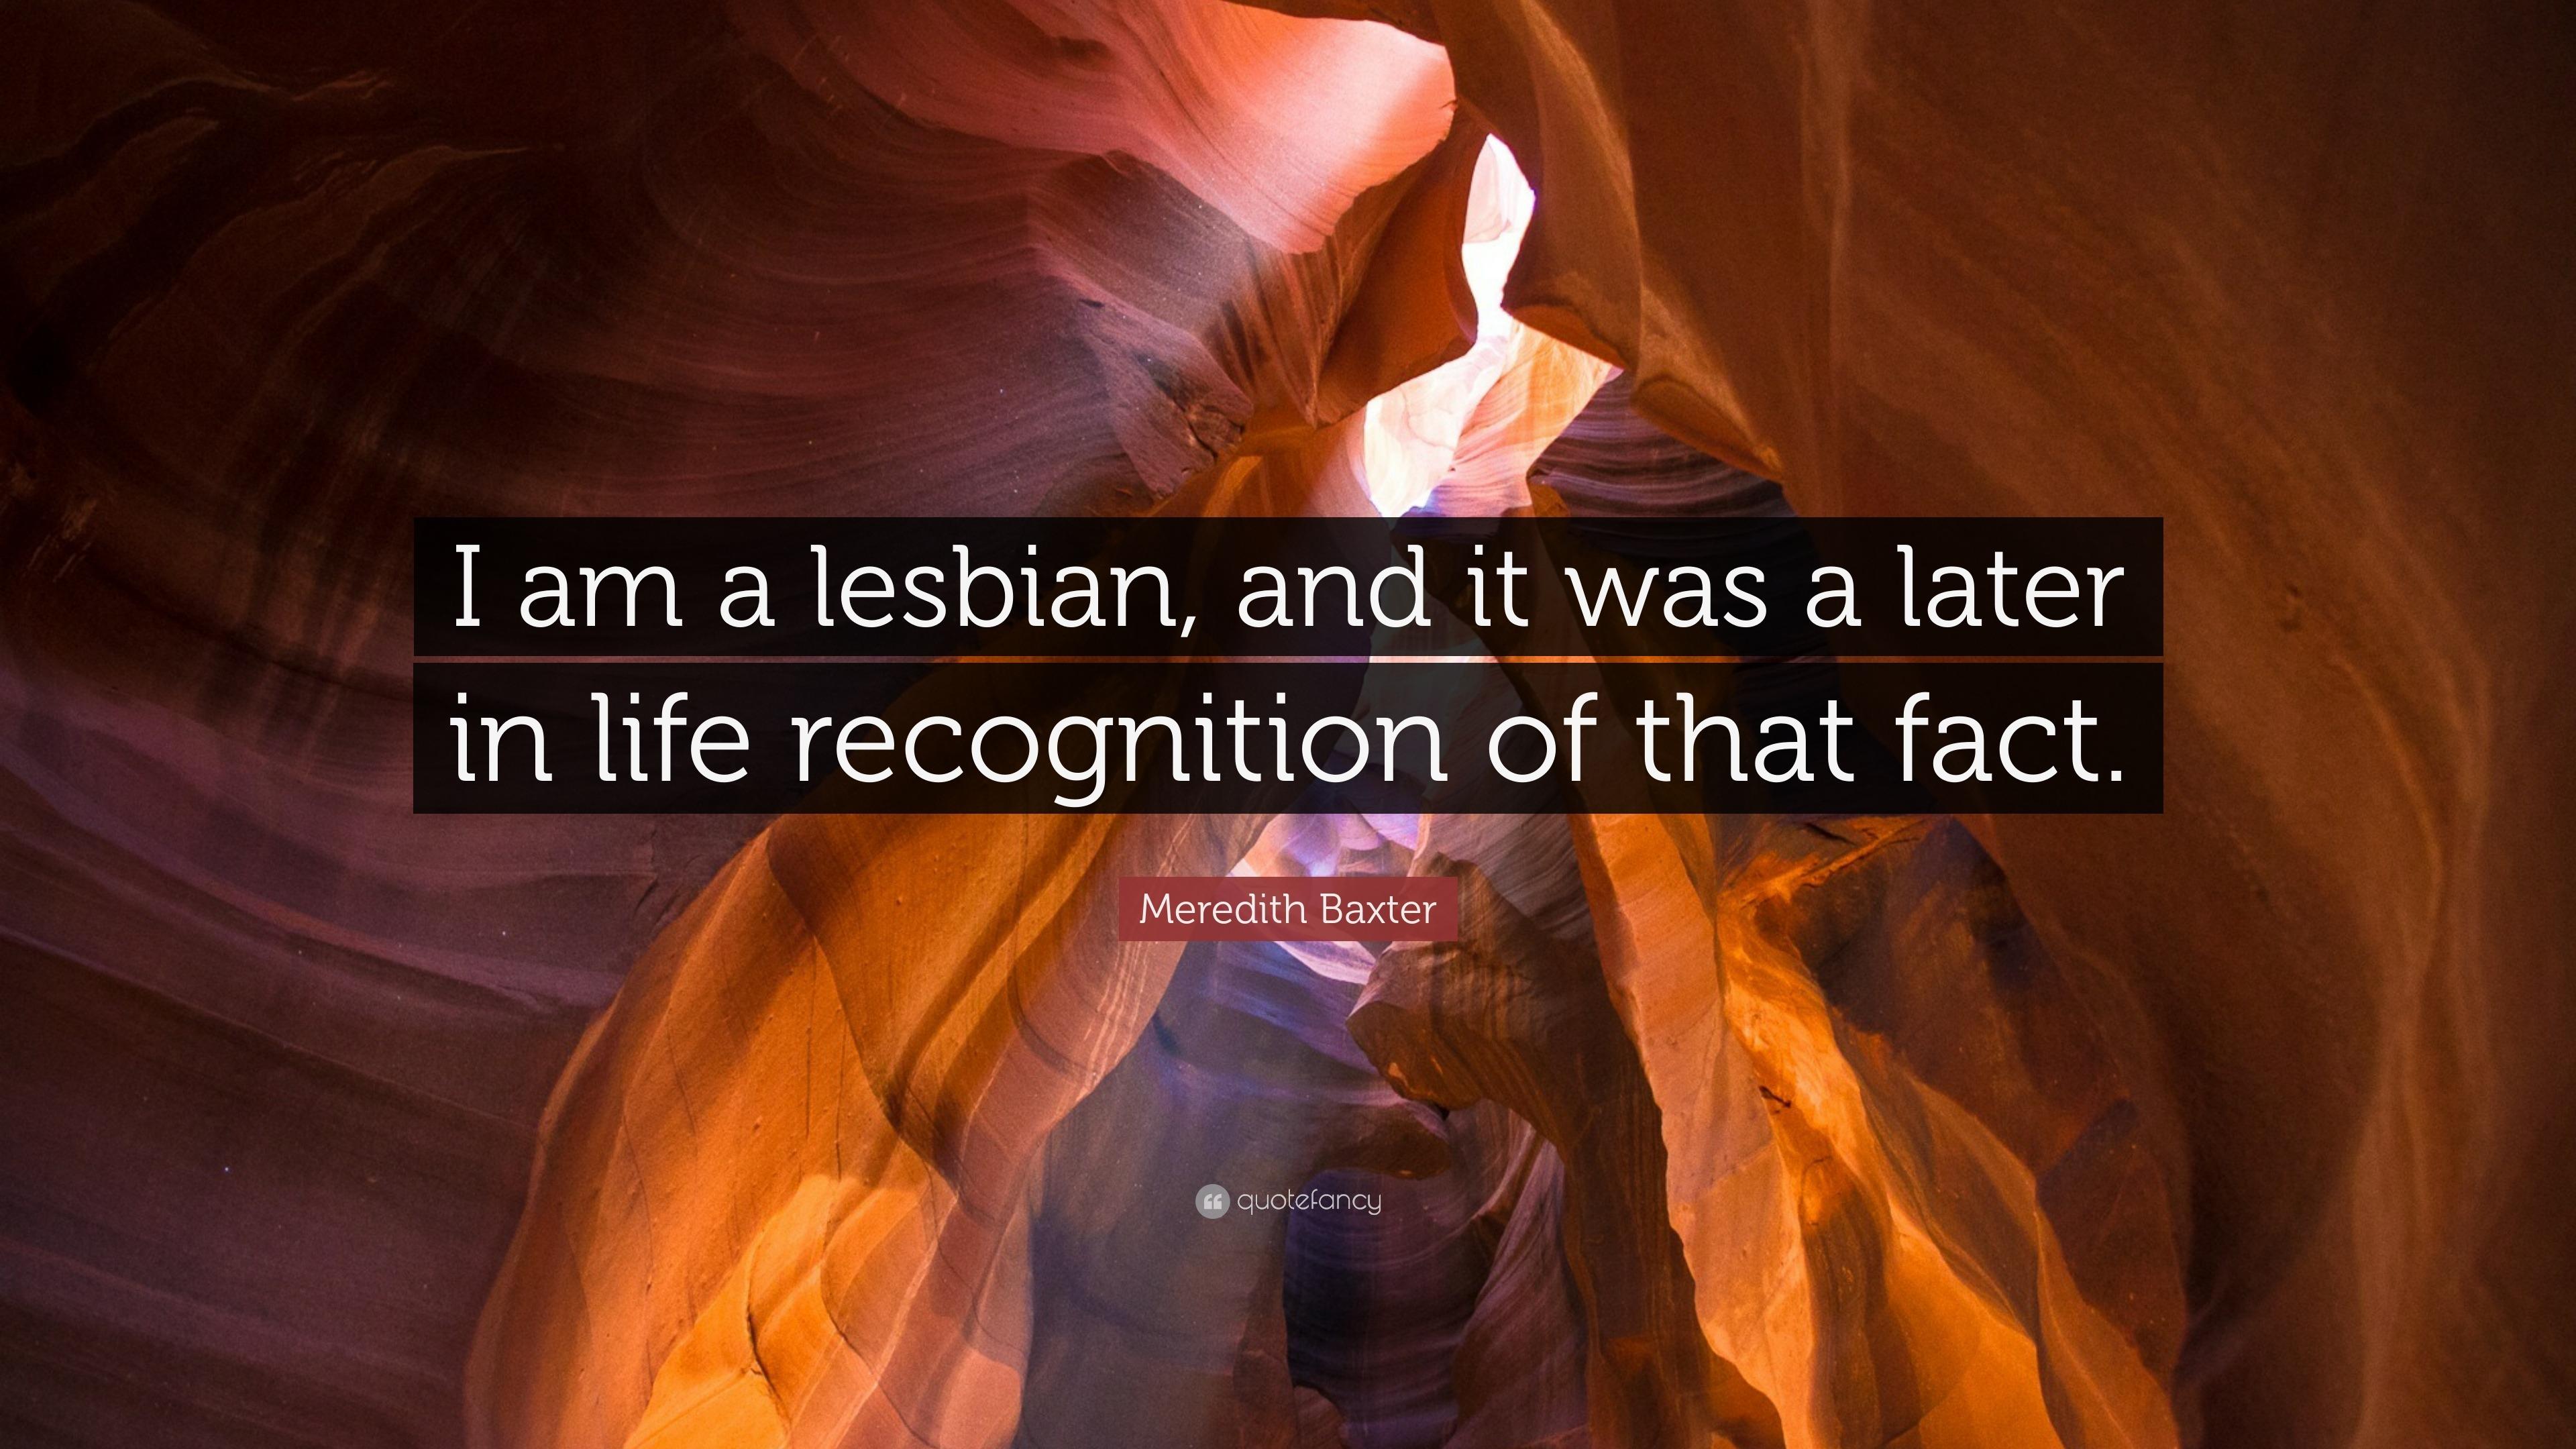 Meredith baxter later life lesbian